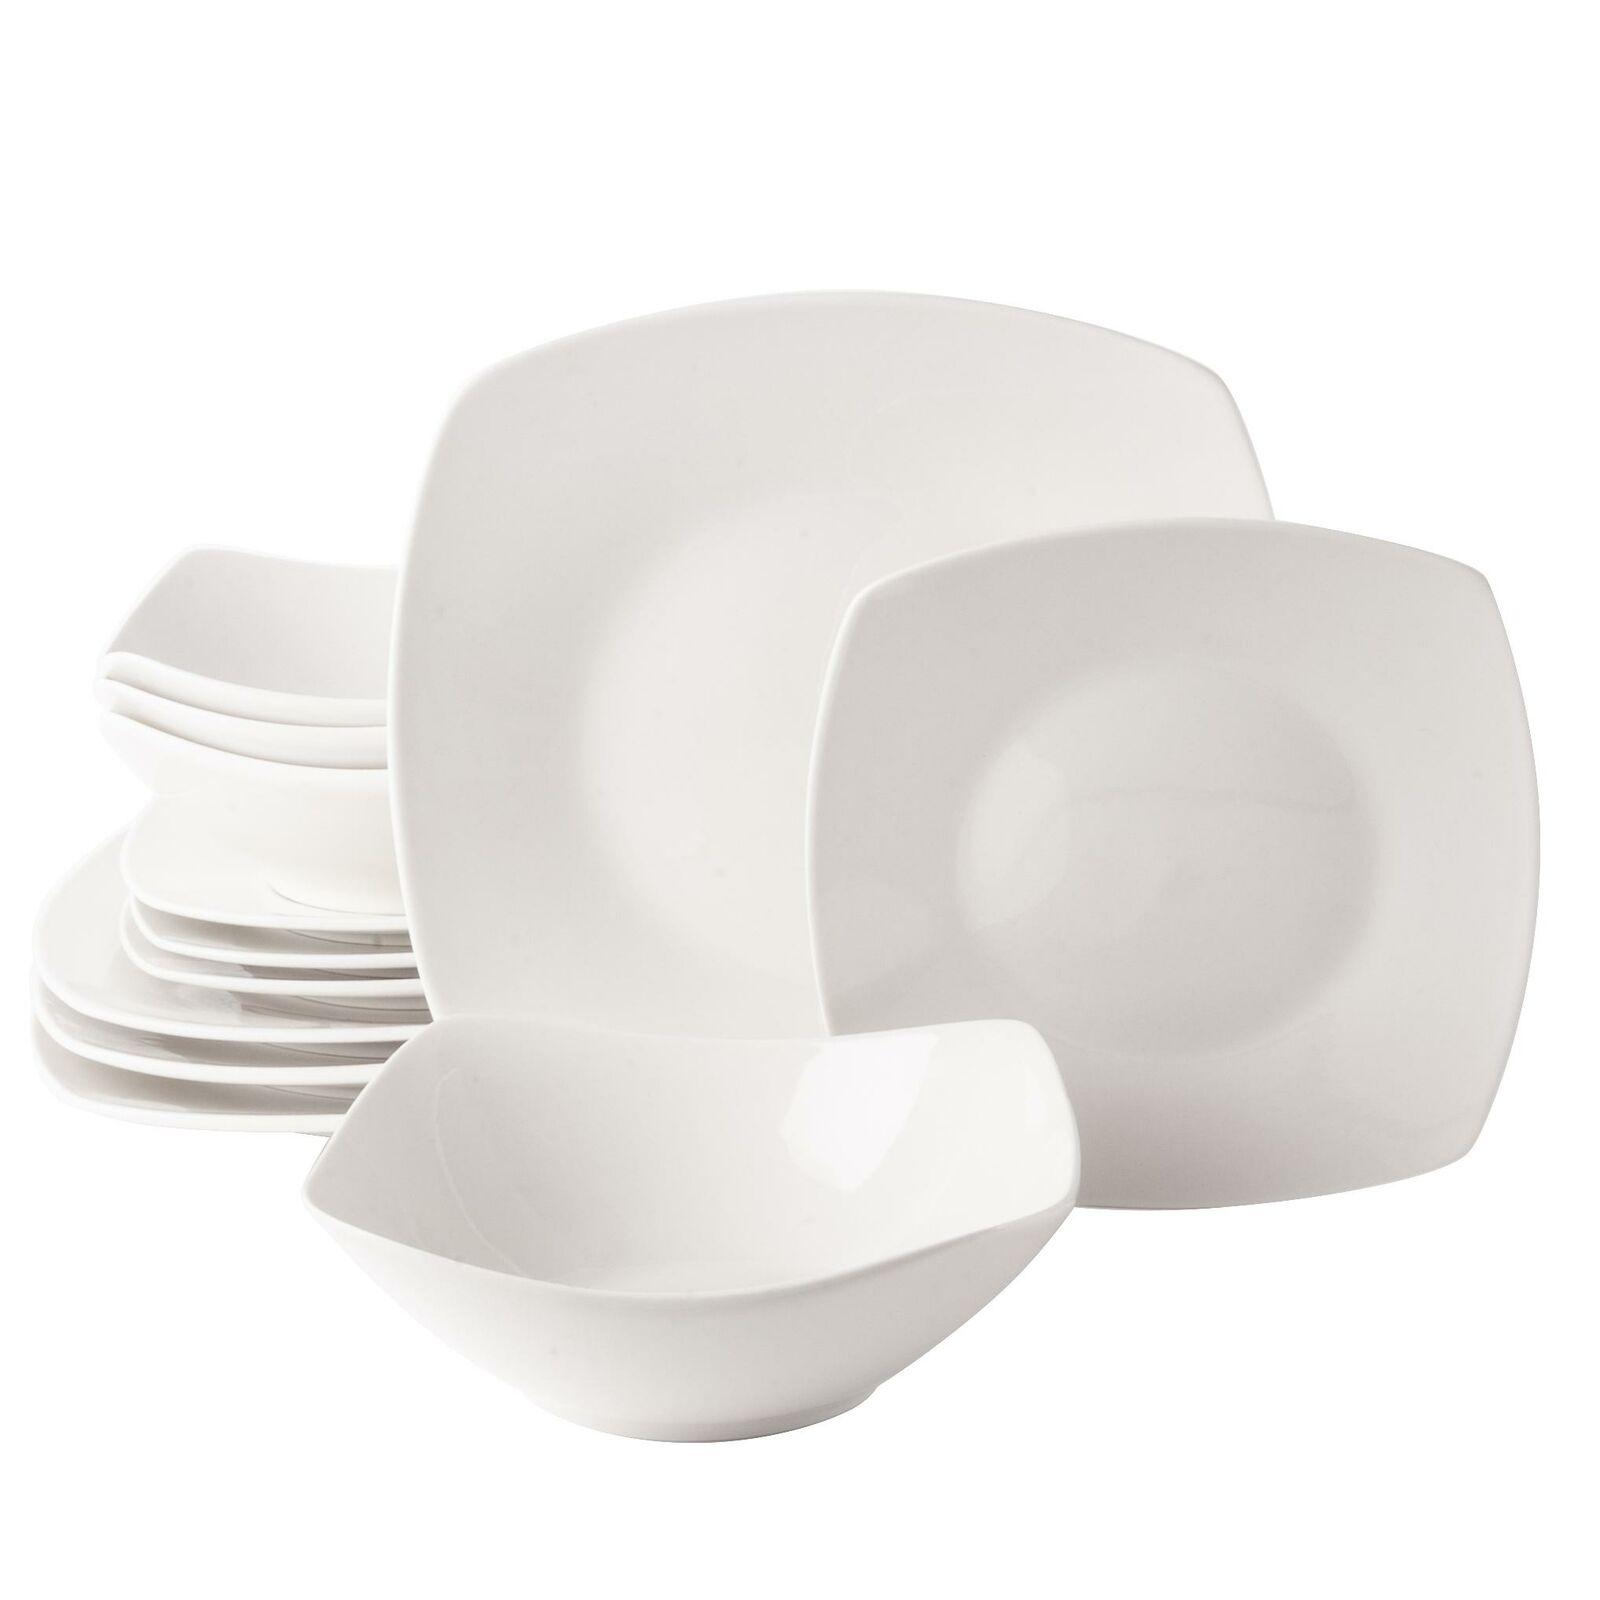 Gibson Home 118505 12r 12 Piece Square Ceramic Dinnerware Set For Sale Online Ebay